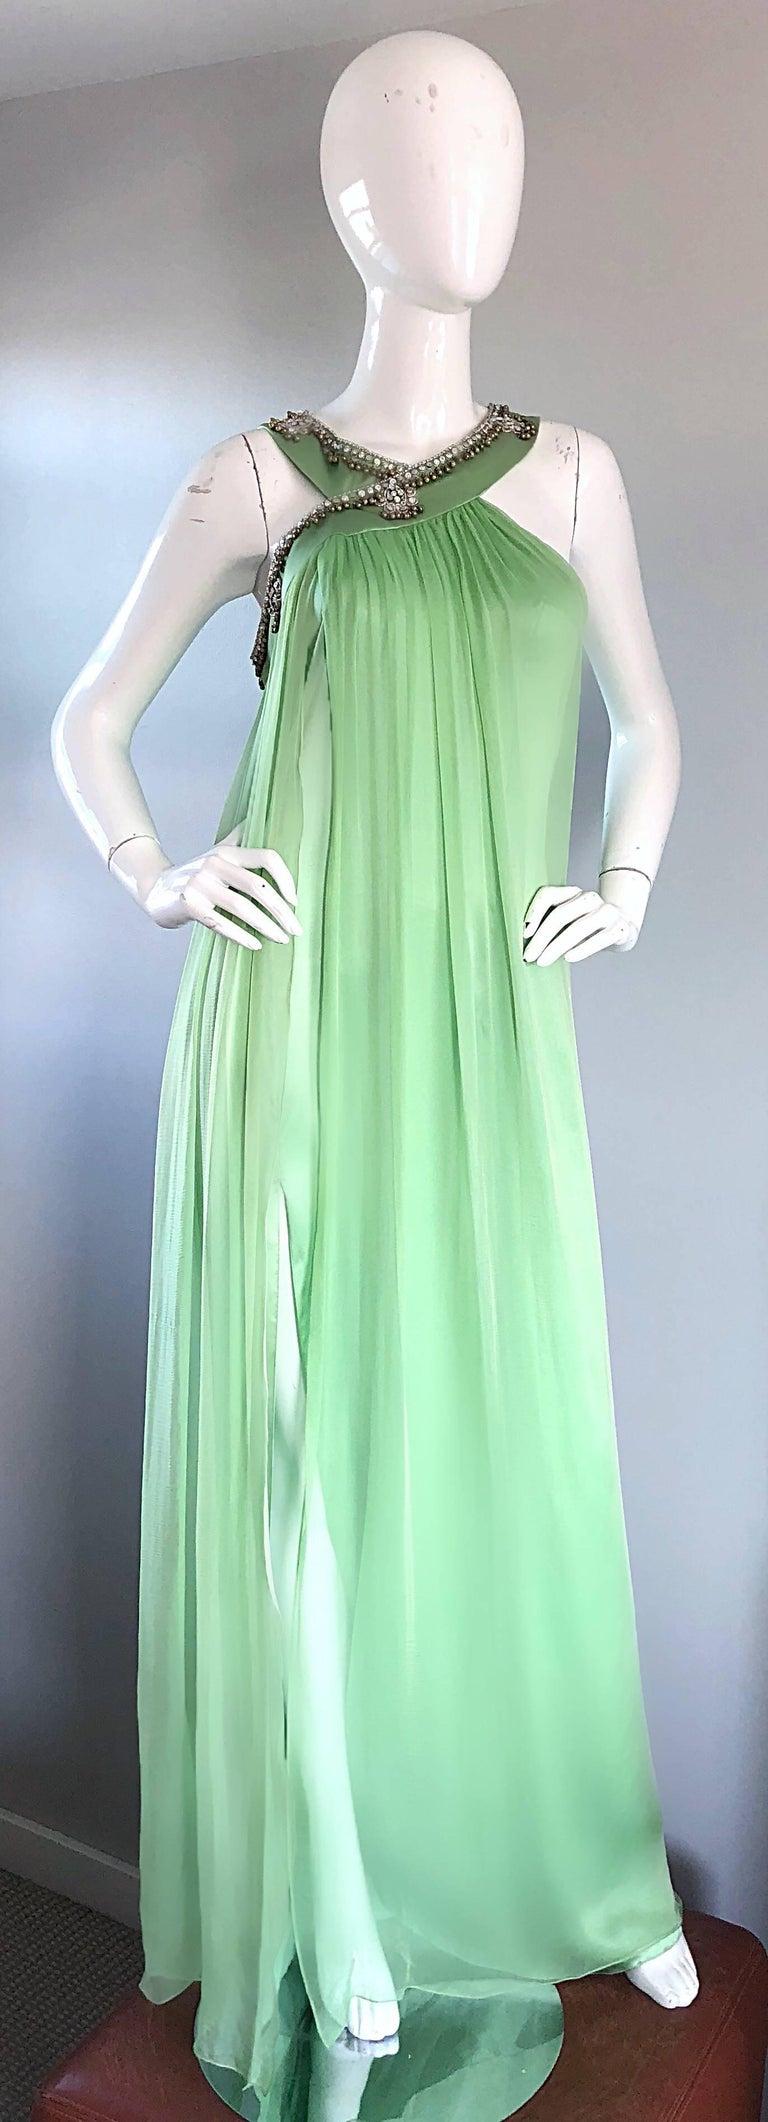 New Christian Dior John Galliano Light Green Silk Chiffon Grecian Gown, Sz 10   For Sale 2